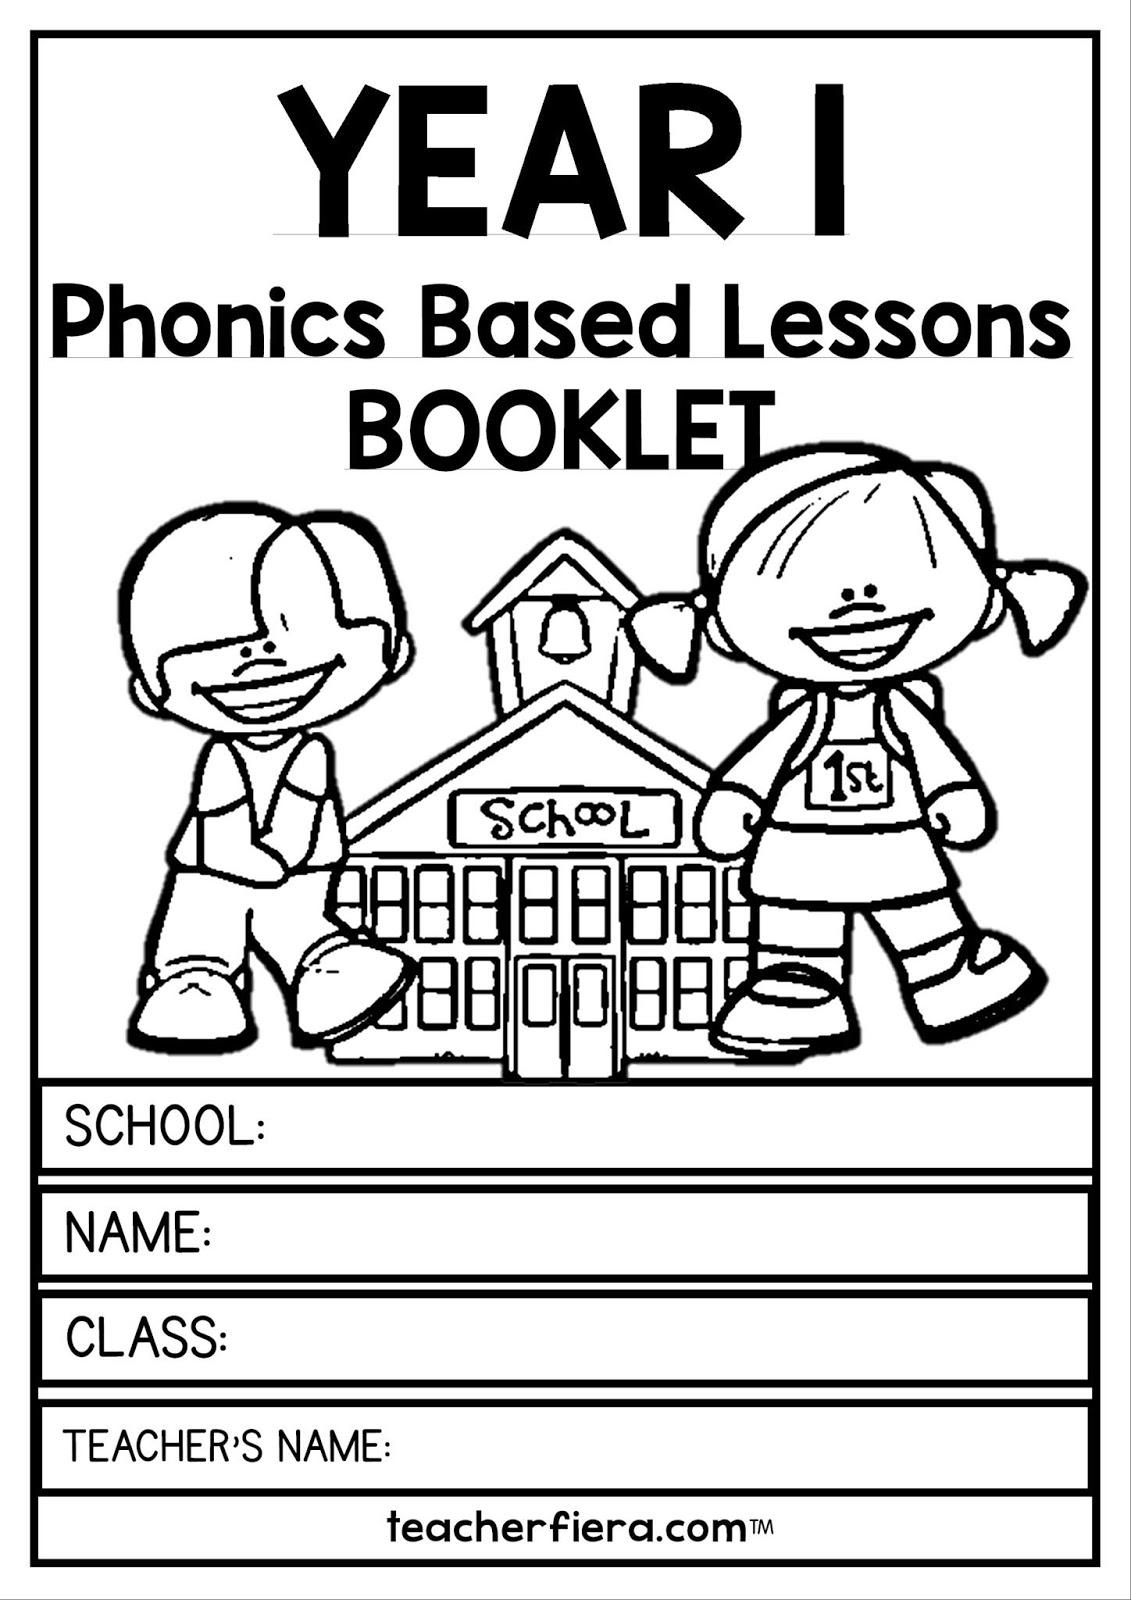 Teacherfiera Year 1 Phonics Based Lessons Booklet